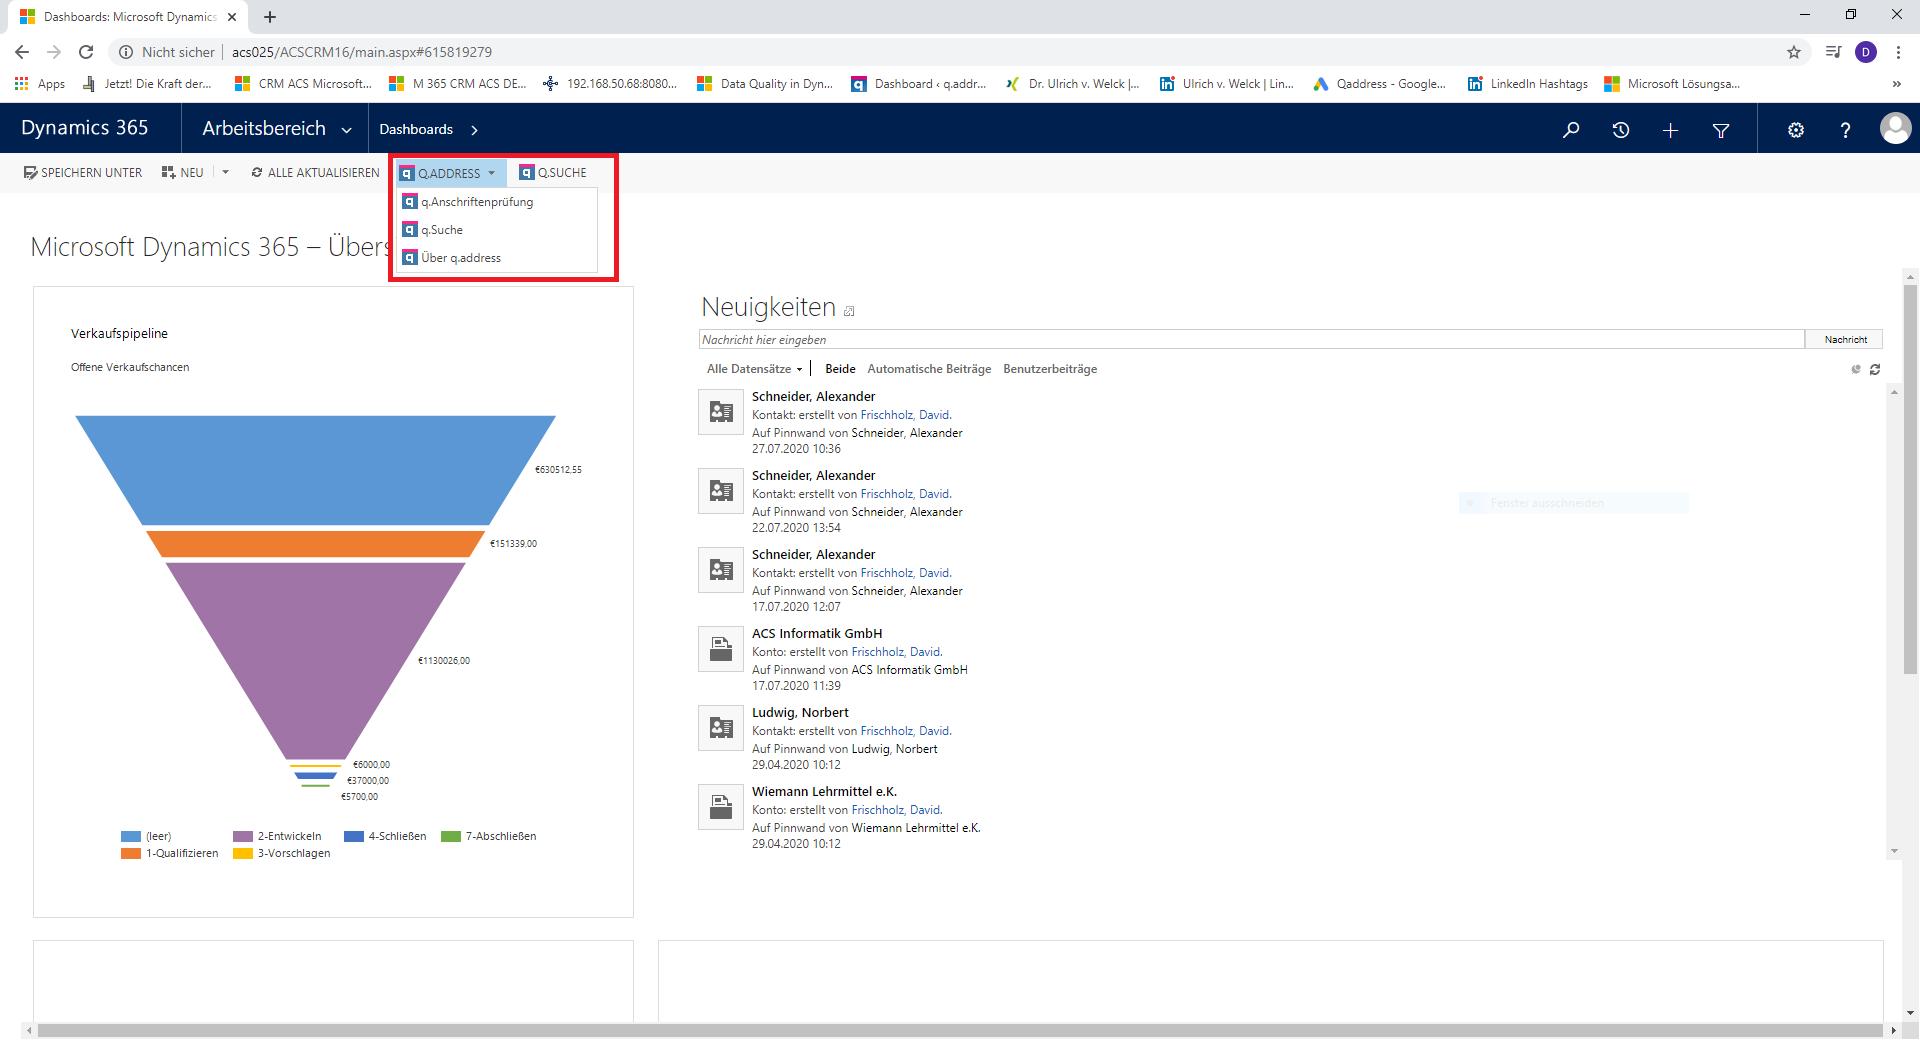 qaddress-Fehlertolerante-Suche-Microsoft-Dynamics-CRM